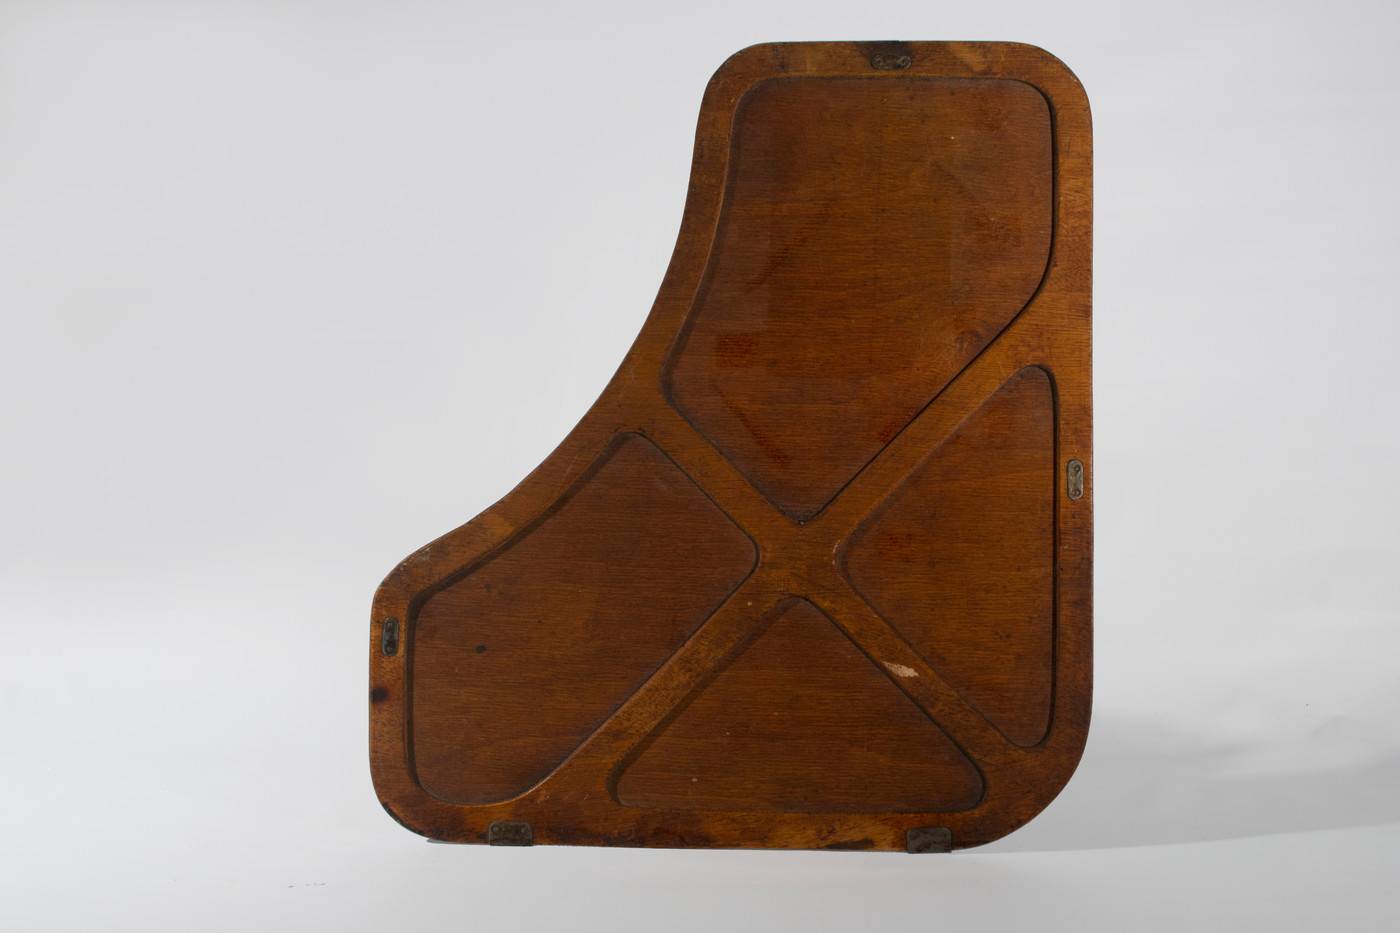 Rumpler CIV C7610 17 Wood Cover front.jp